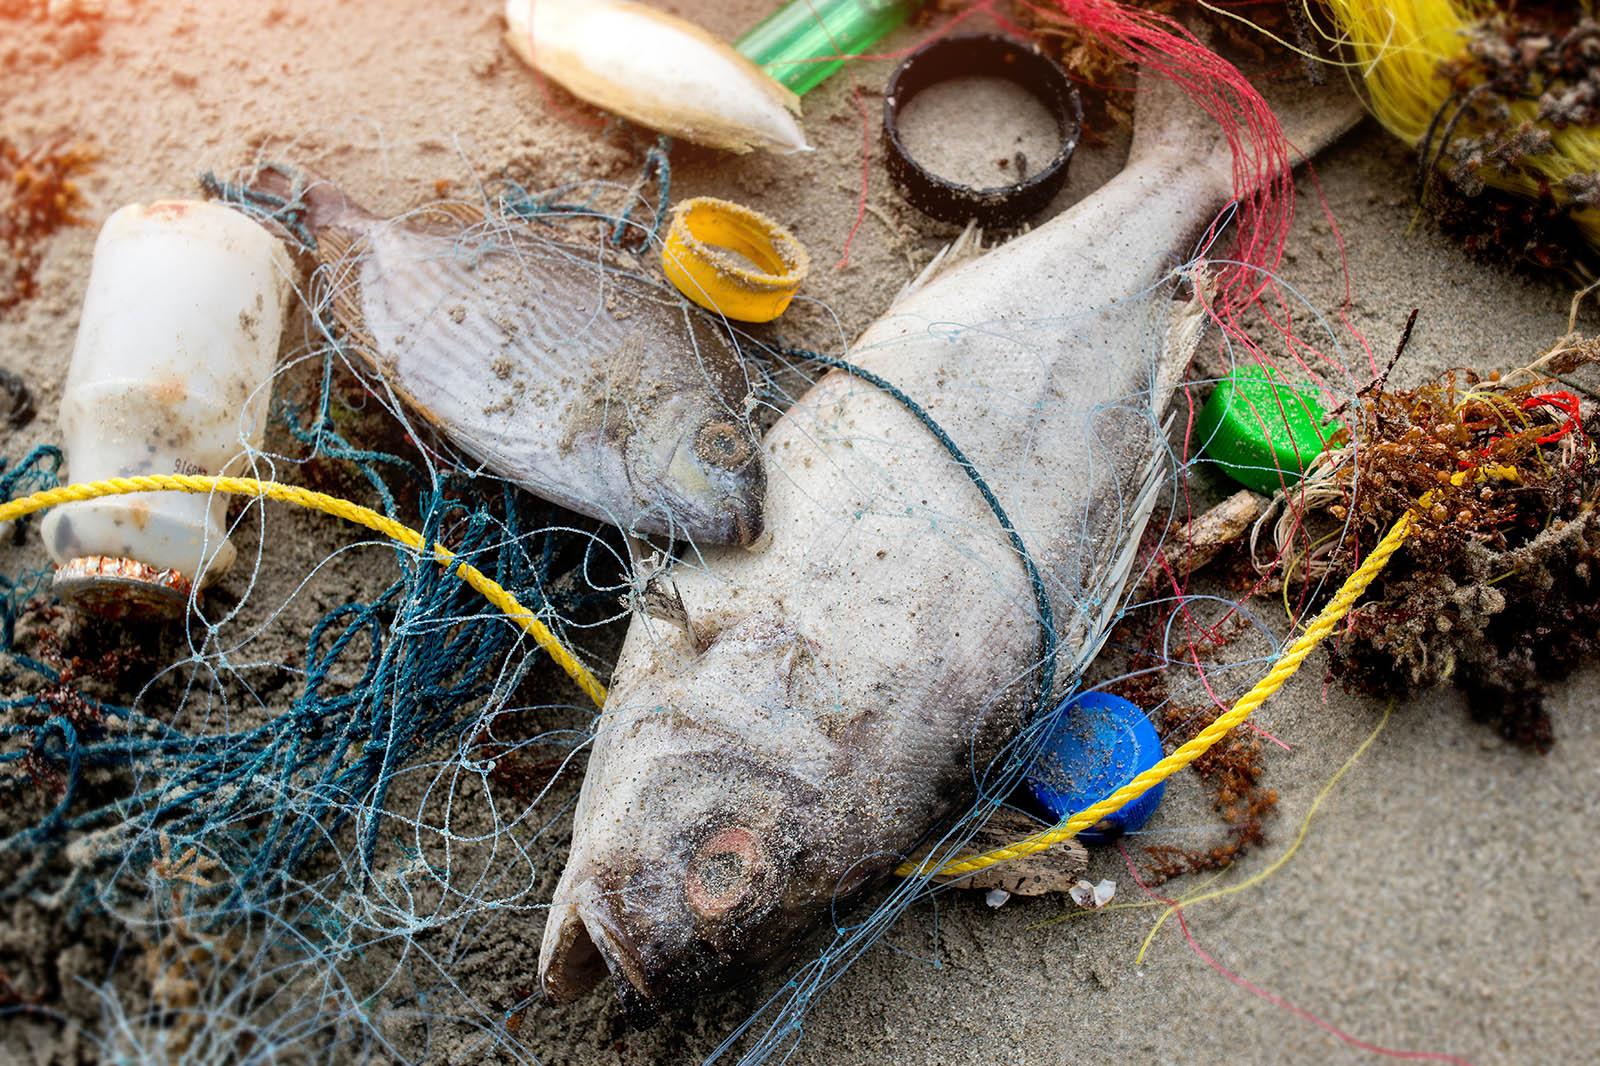 Toter Fisch liegt im Muell am Strand